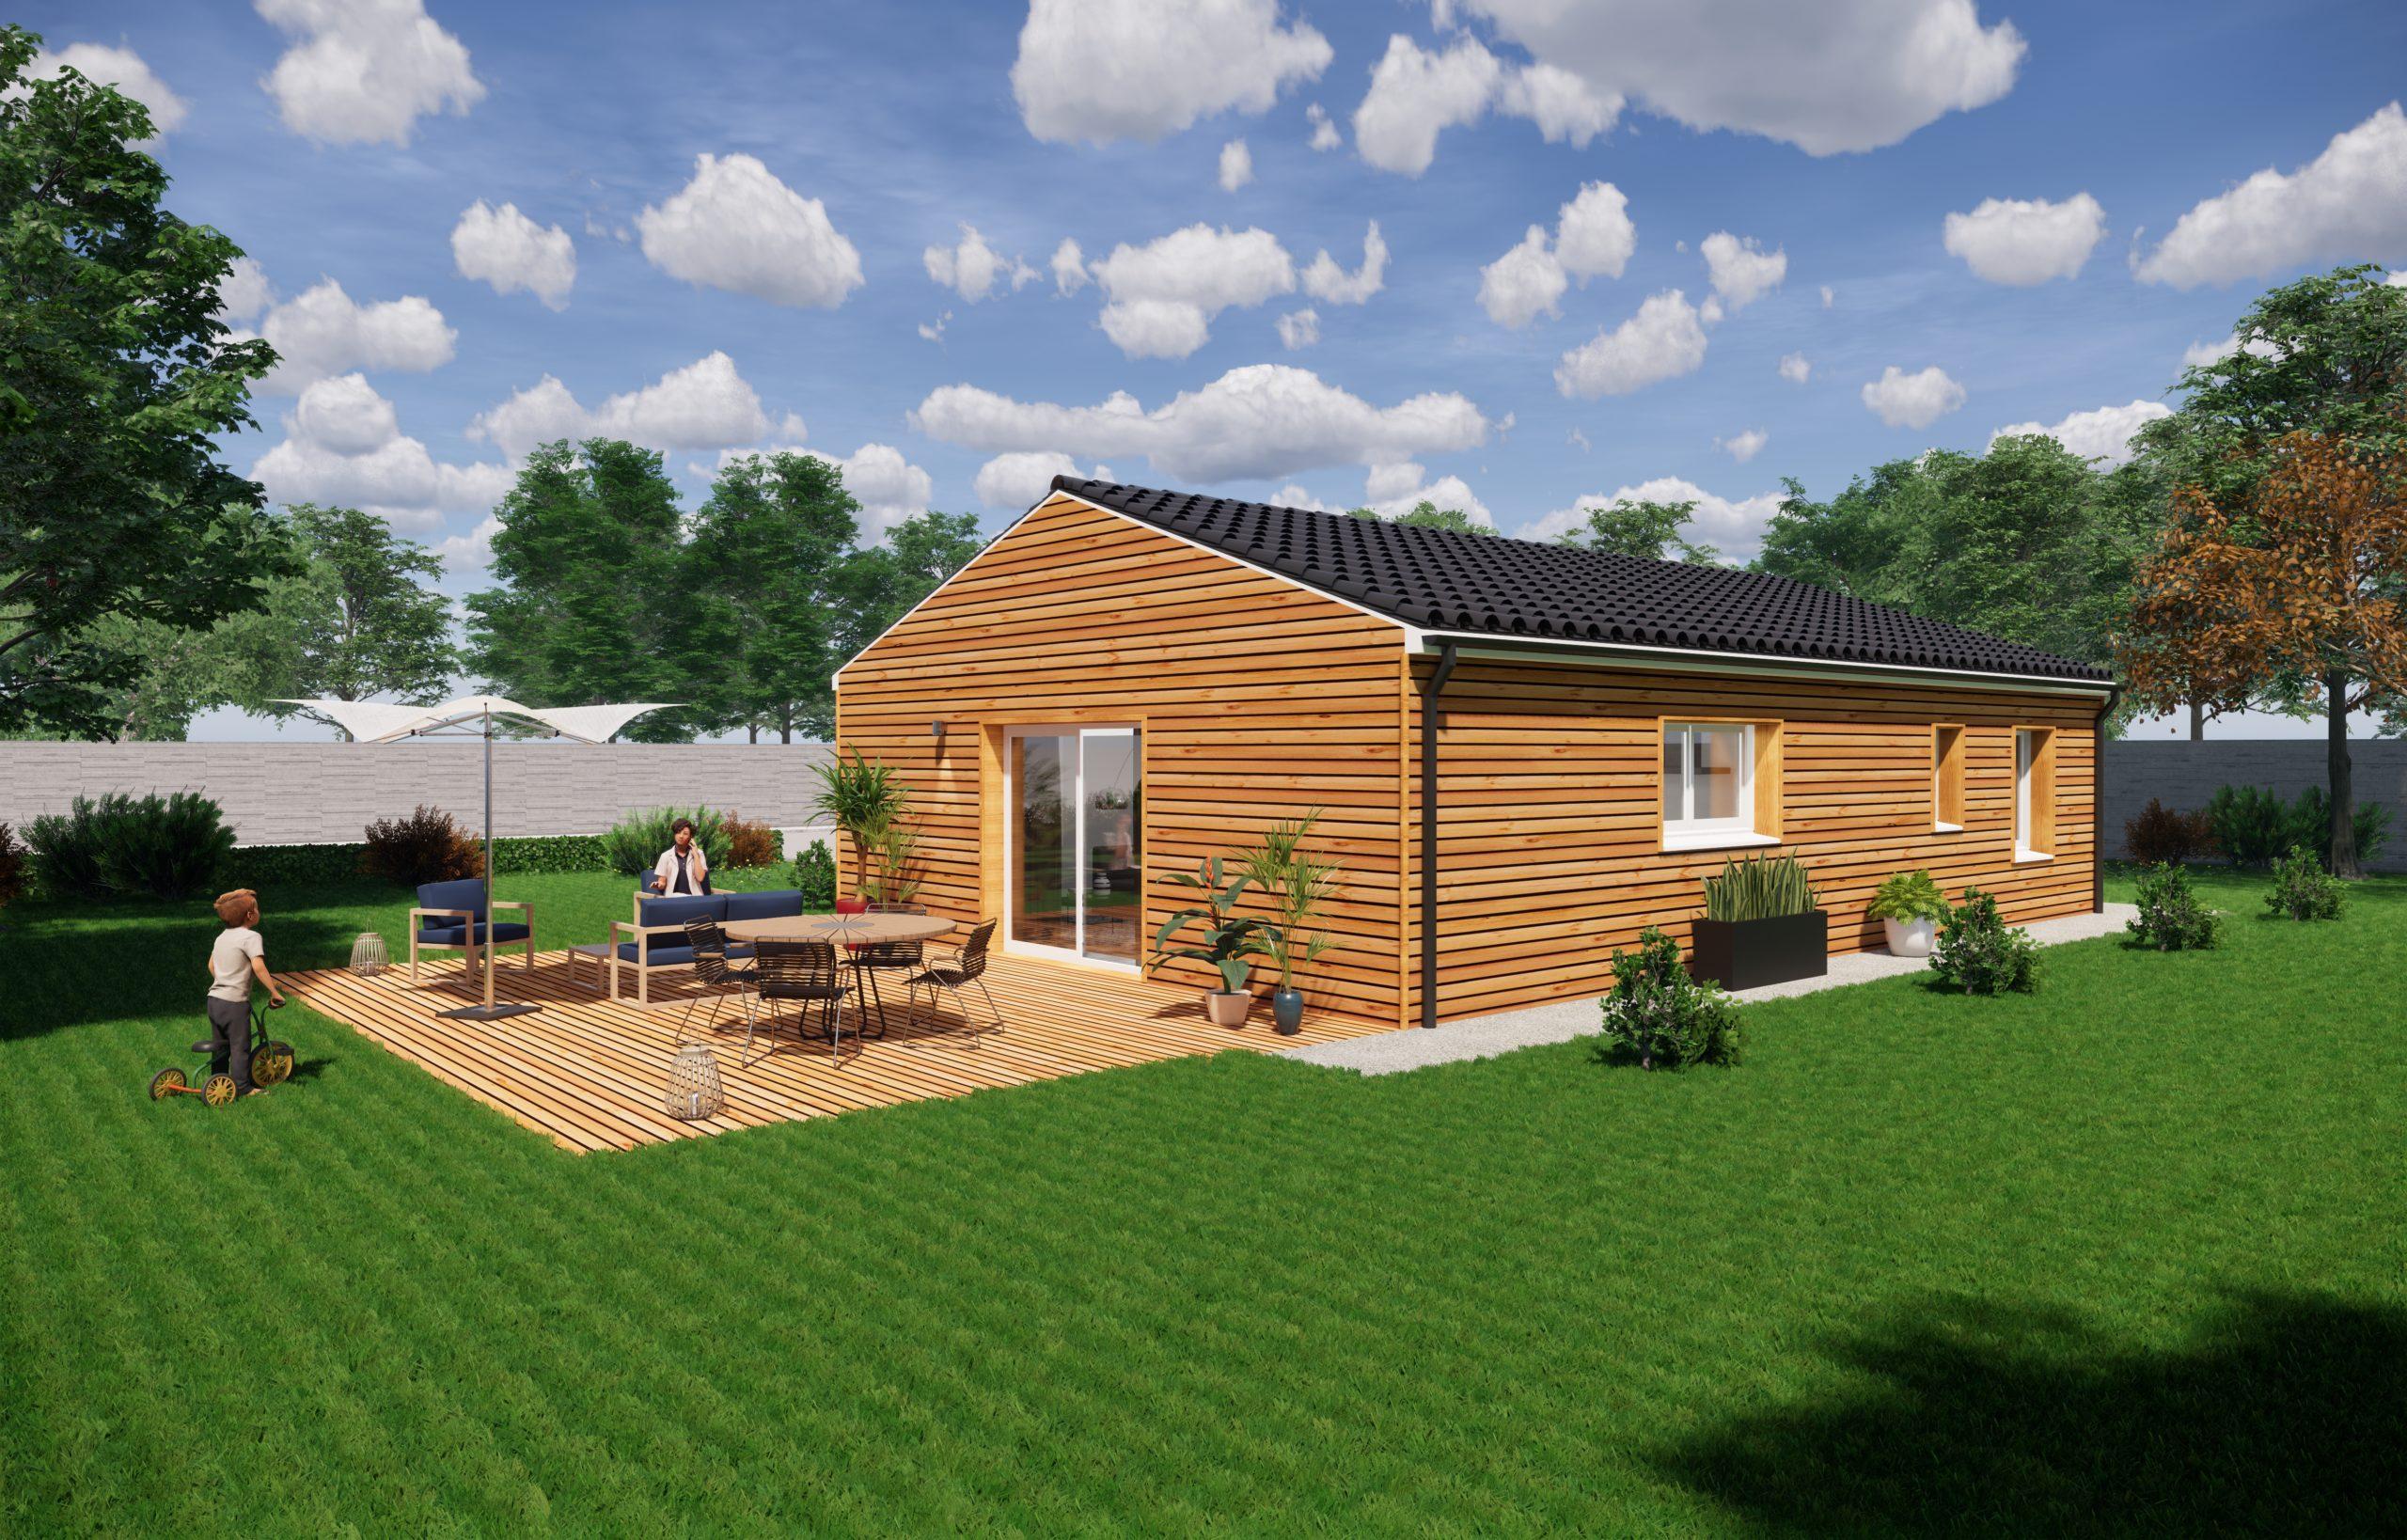 maisons-en-bois-maisons-bois-maison-bois-périgord-maisons-bois-maisons-traditionnelles-maisons-contemporaines-maison-traditionnelle-maison-contemporaine-dordogne-sarlat-périgord-terrain-à-vendre-se-faire-construire